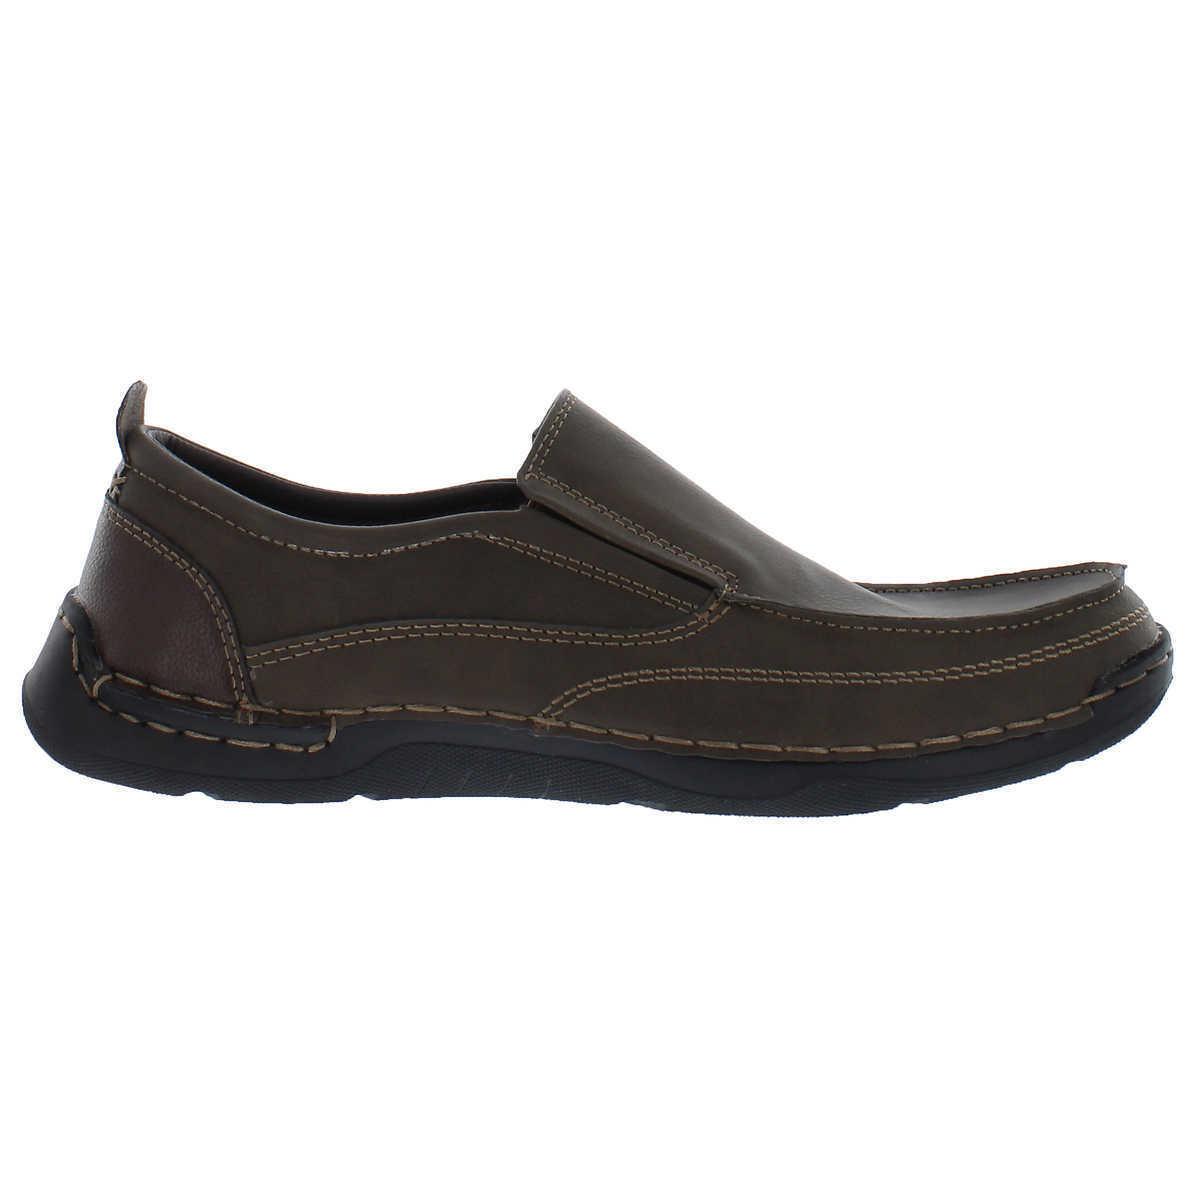 Izod Thomas Men's Slip On Shoe Memory Foam Flexible LightWeight Loafer 2